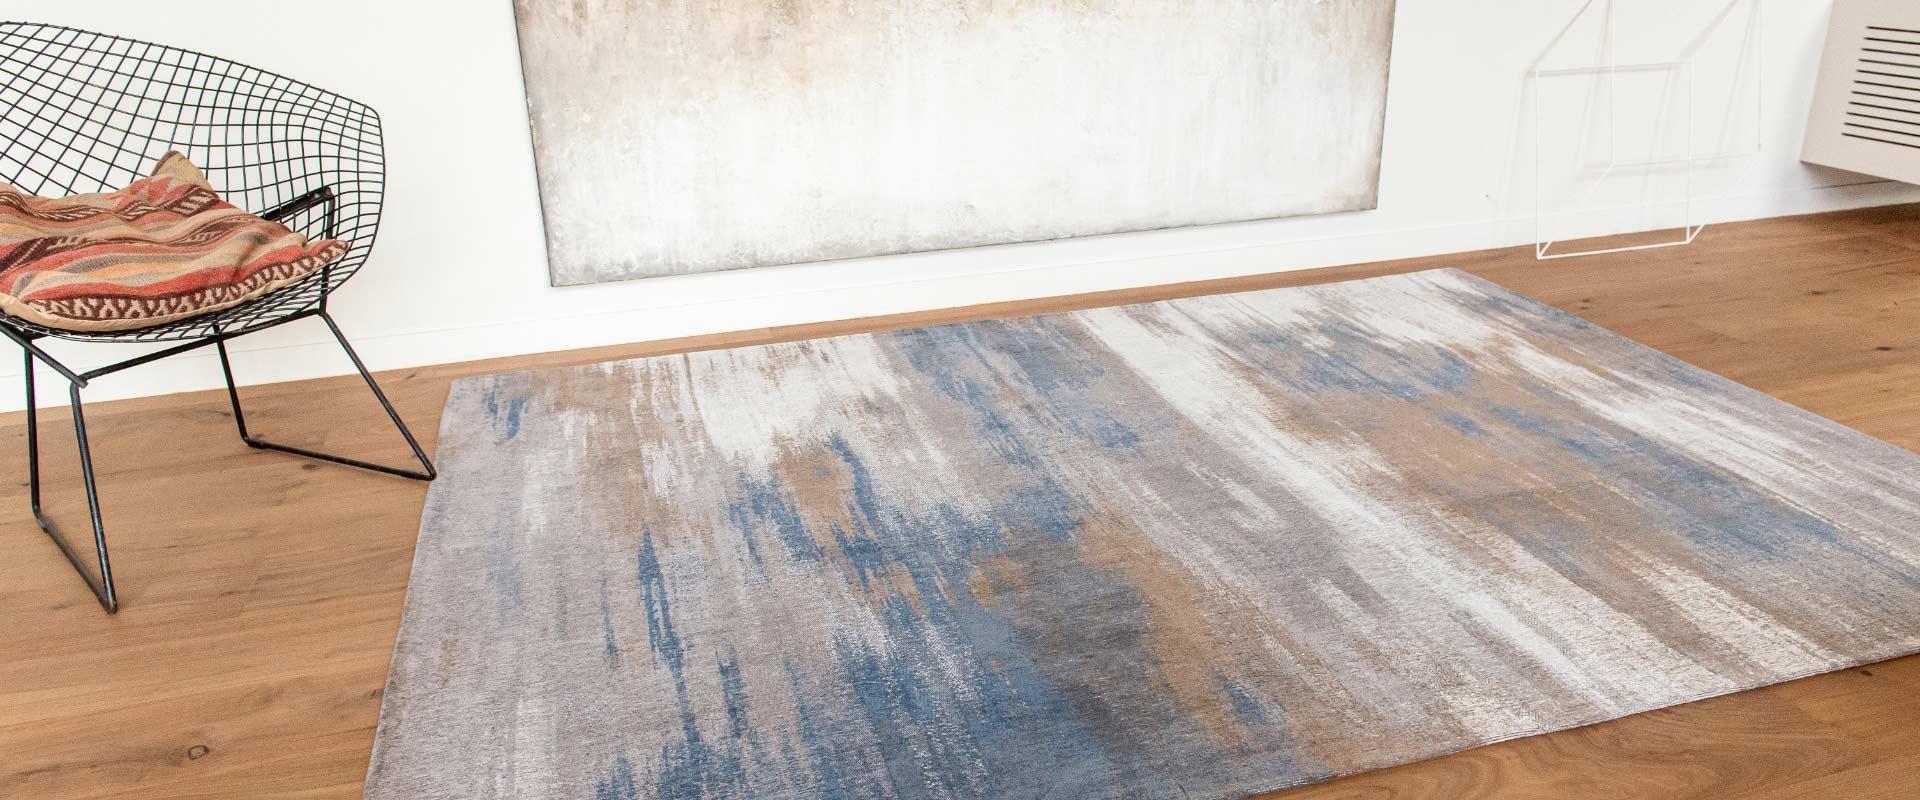 carpette-diapo-image-1